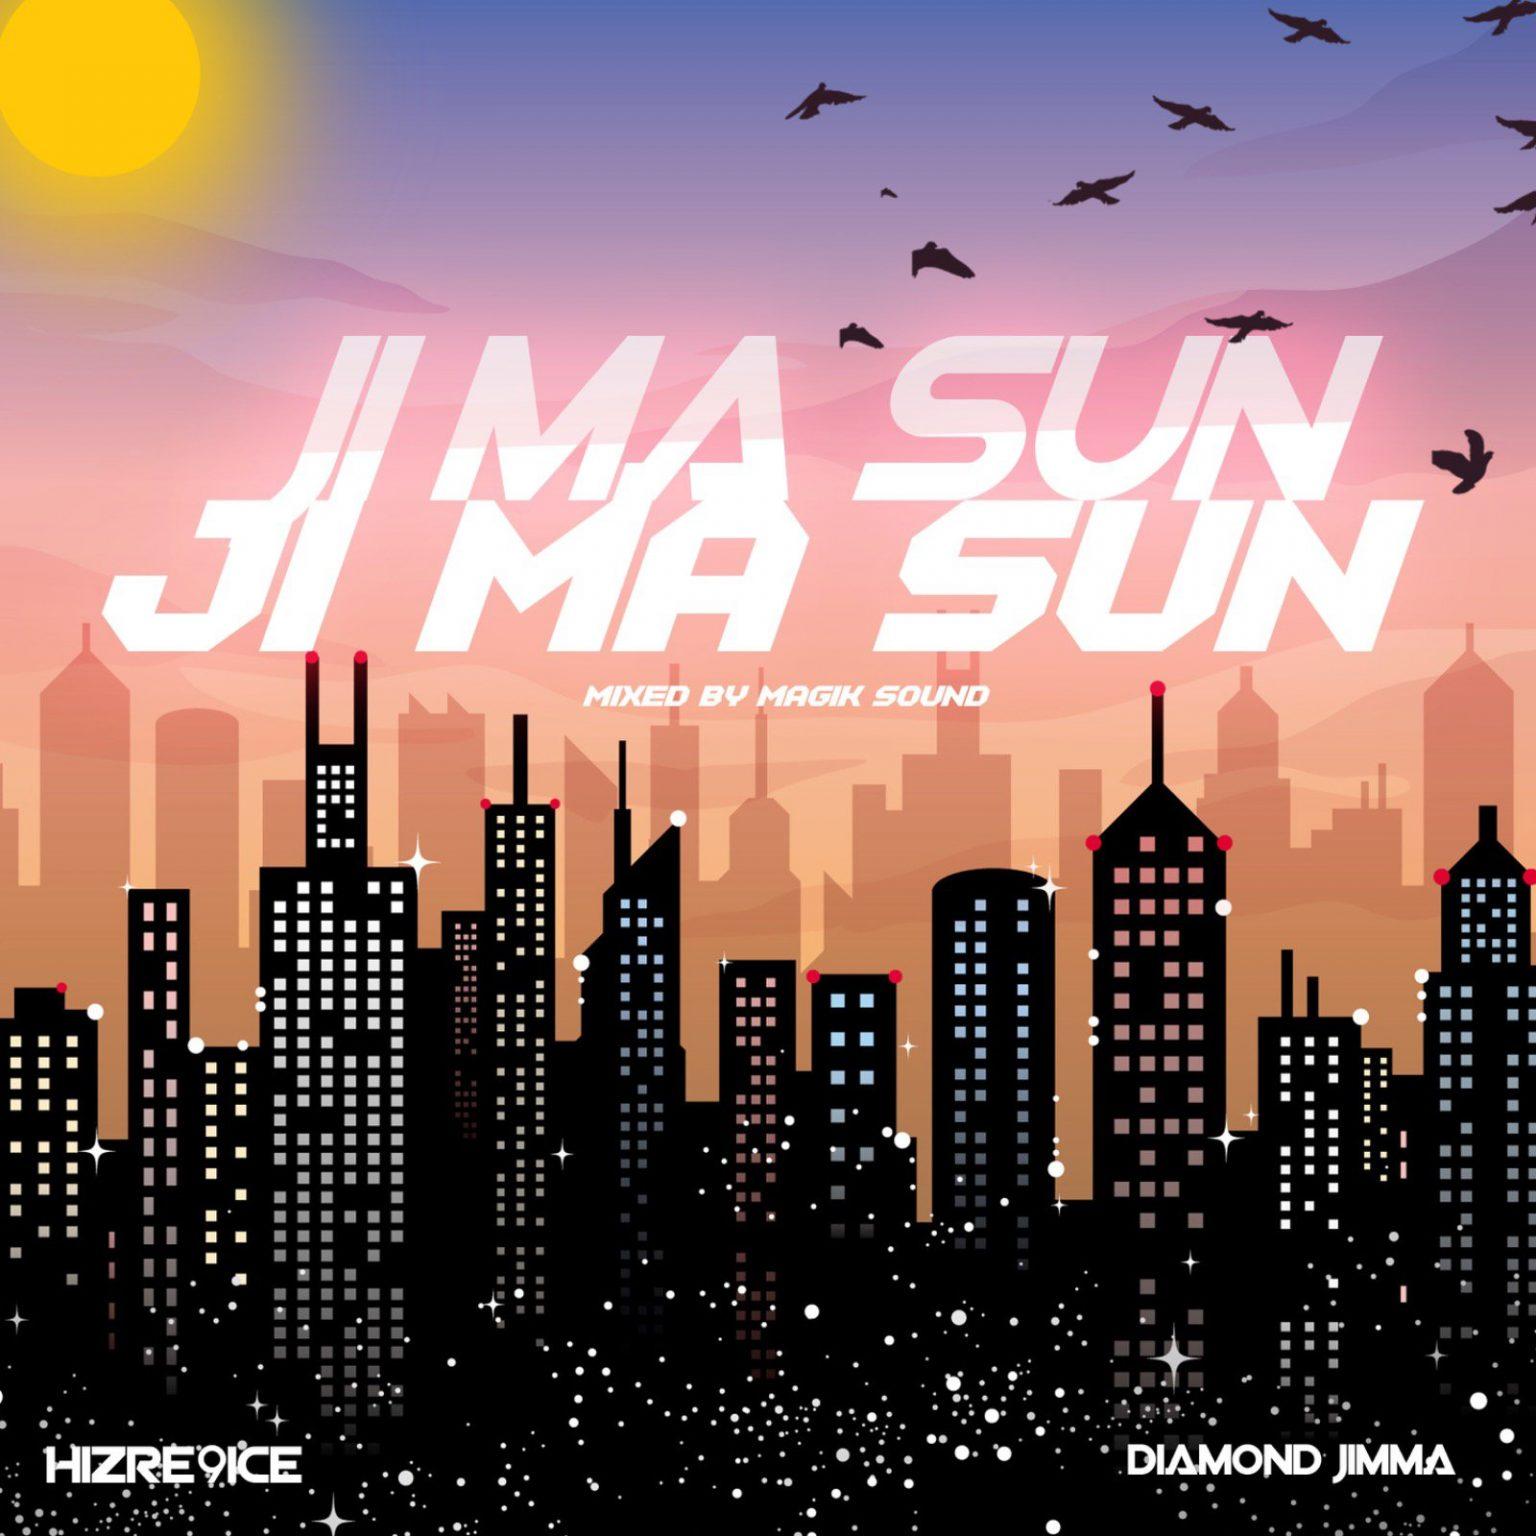 Hizre9ice Ft. Diamond Jimma – Ji Ma Sun